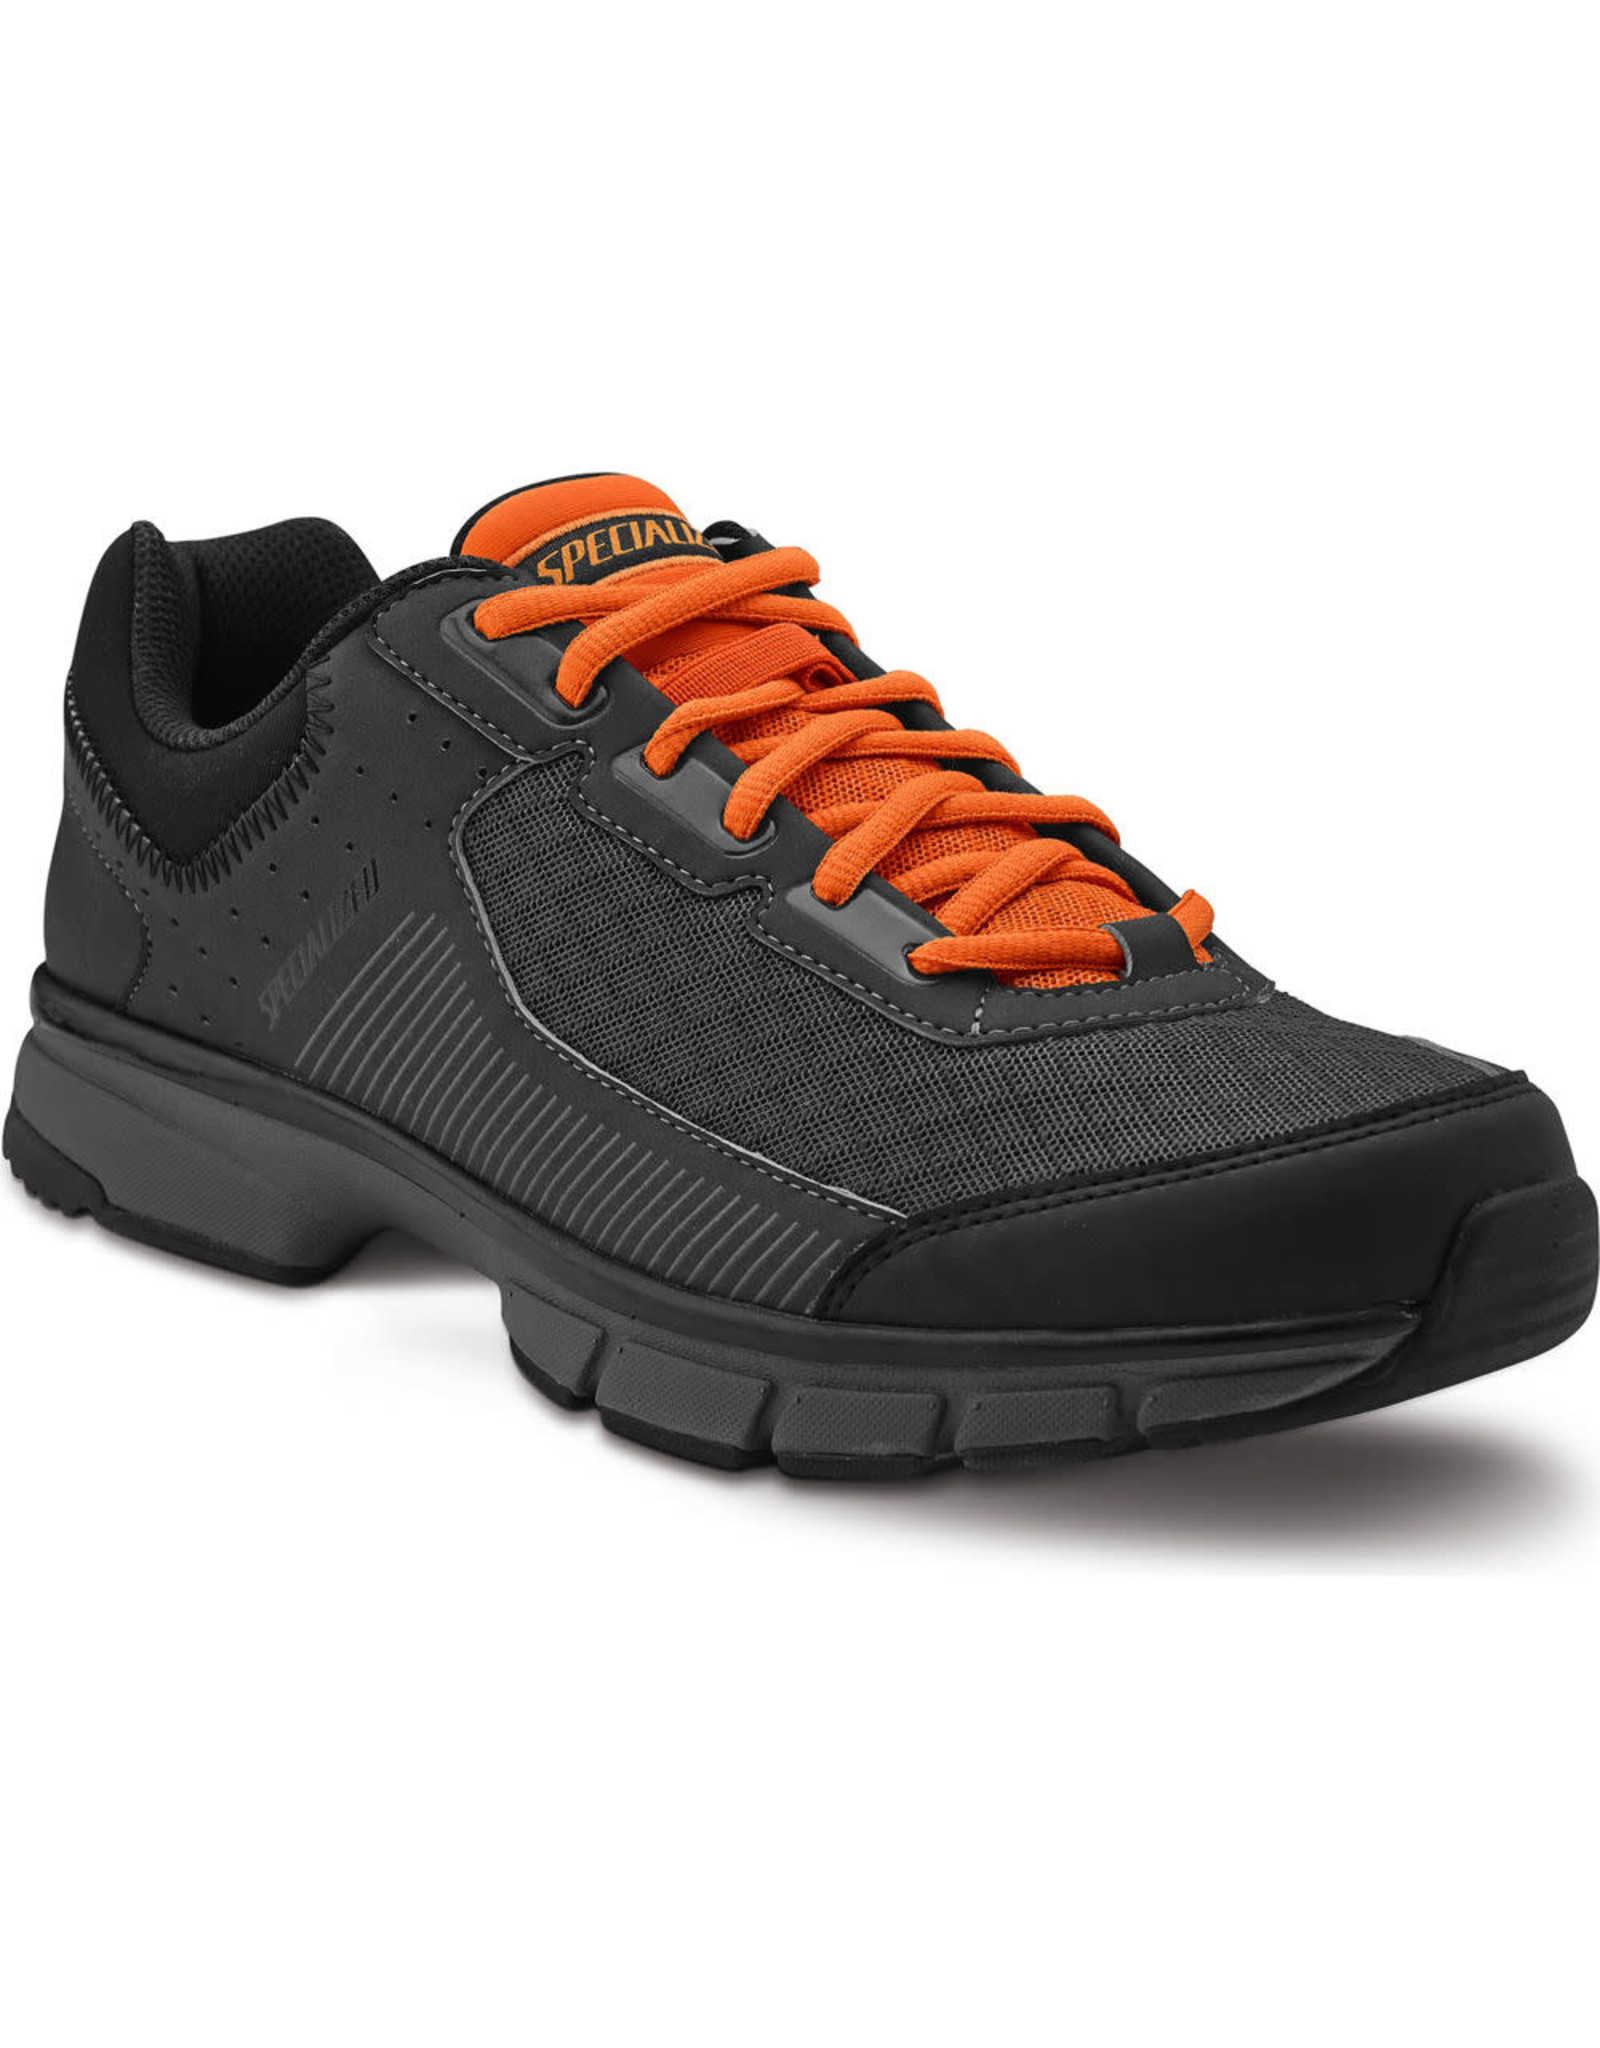 Specialized Shoe Spec Cadet Blk/Carb/Brt Org 45/11.5